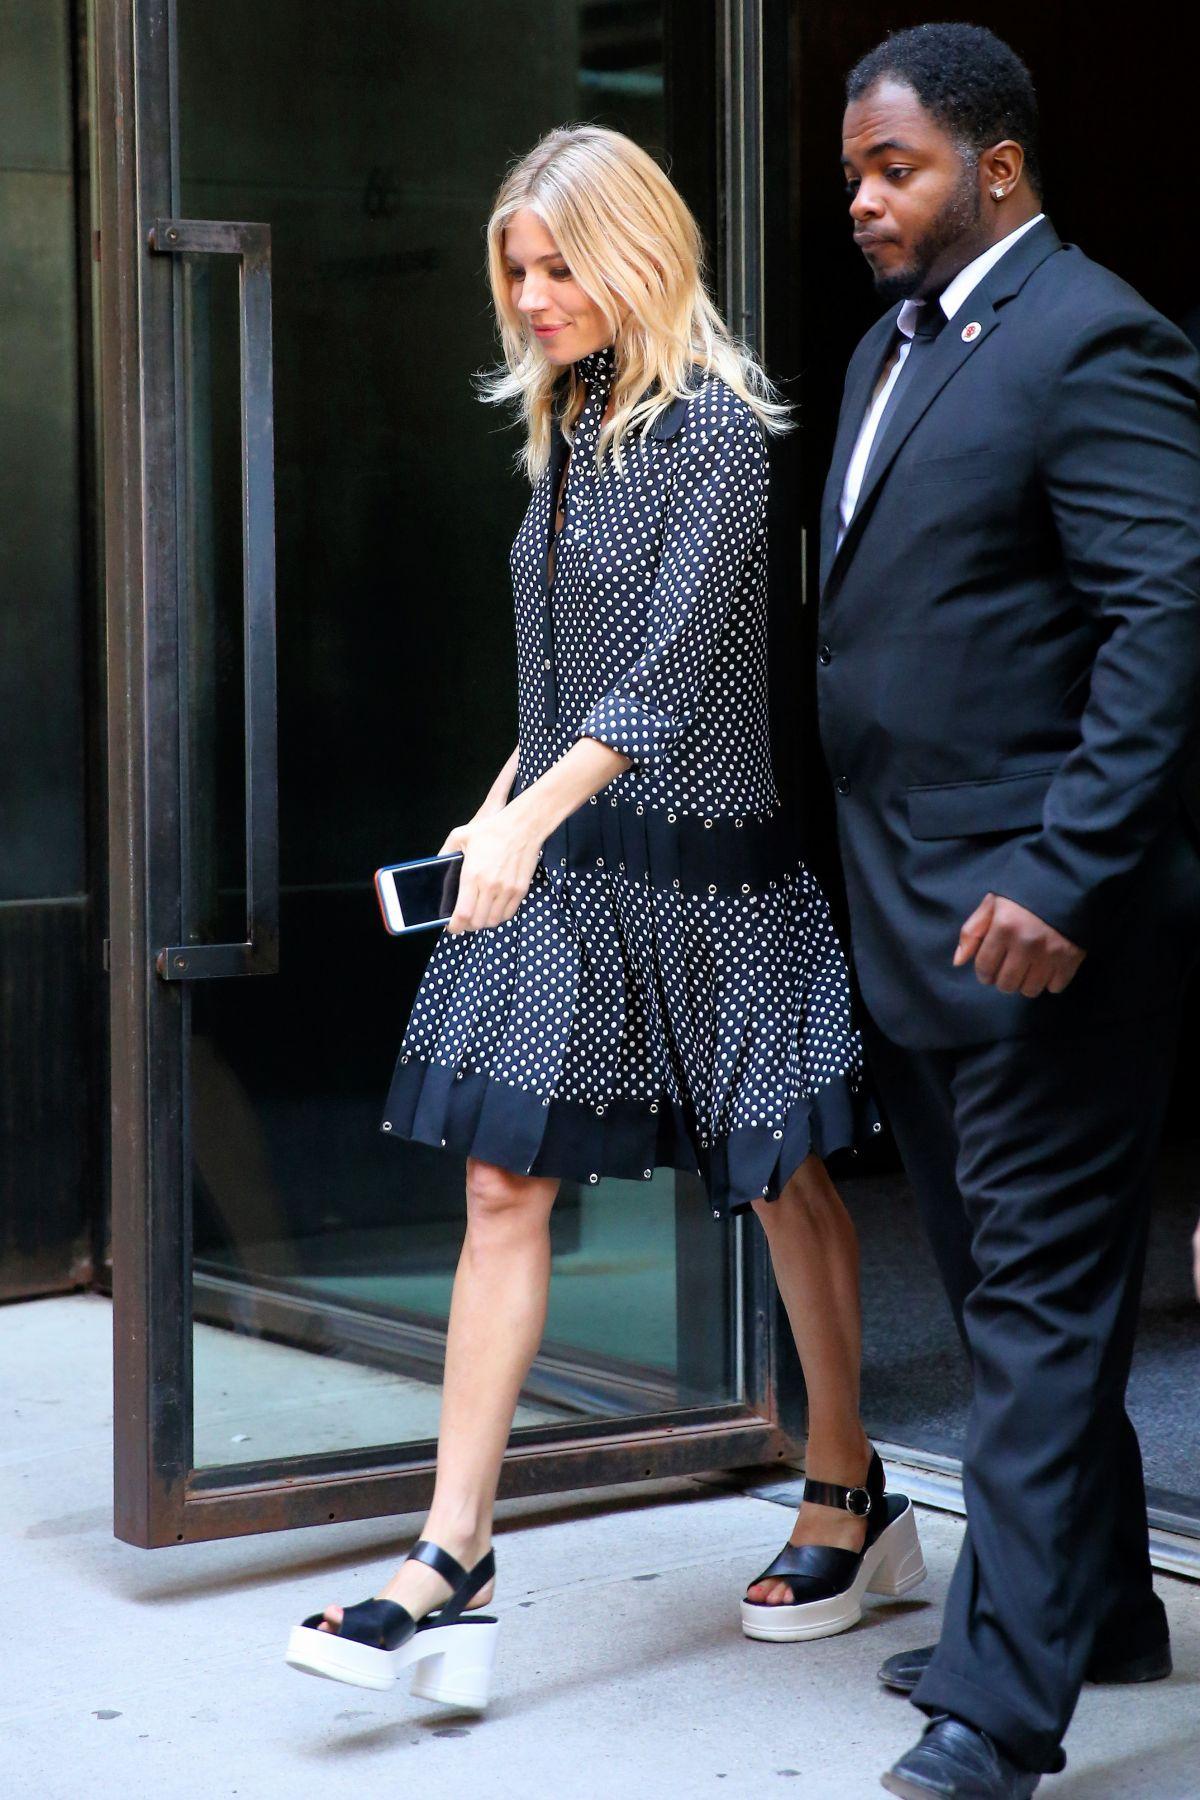 SIENNA MILLER at Michael Kors Fashion Show at New York Fashion Week 09/14/2016